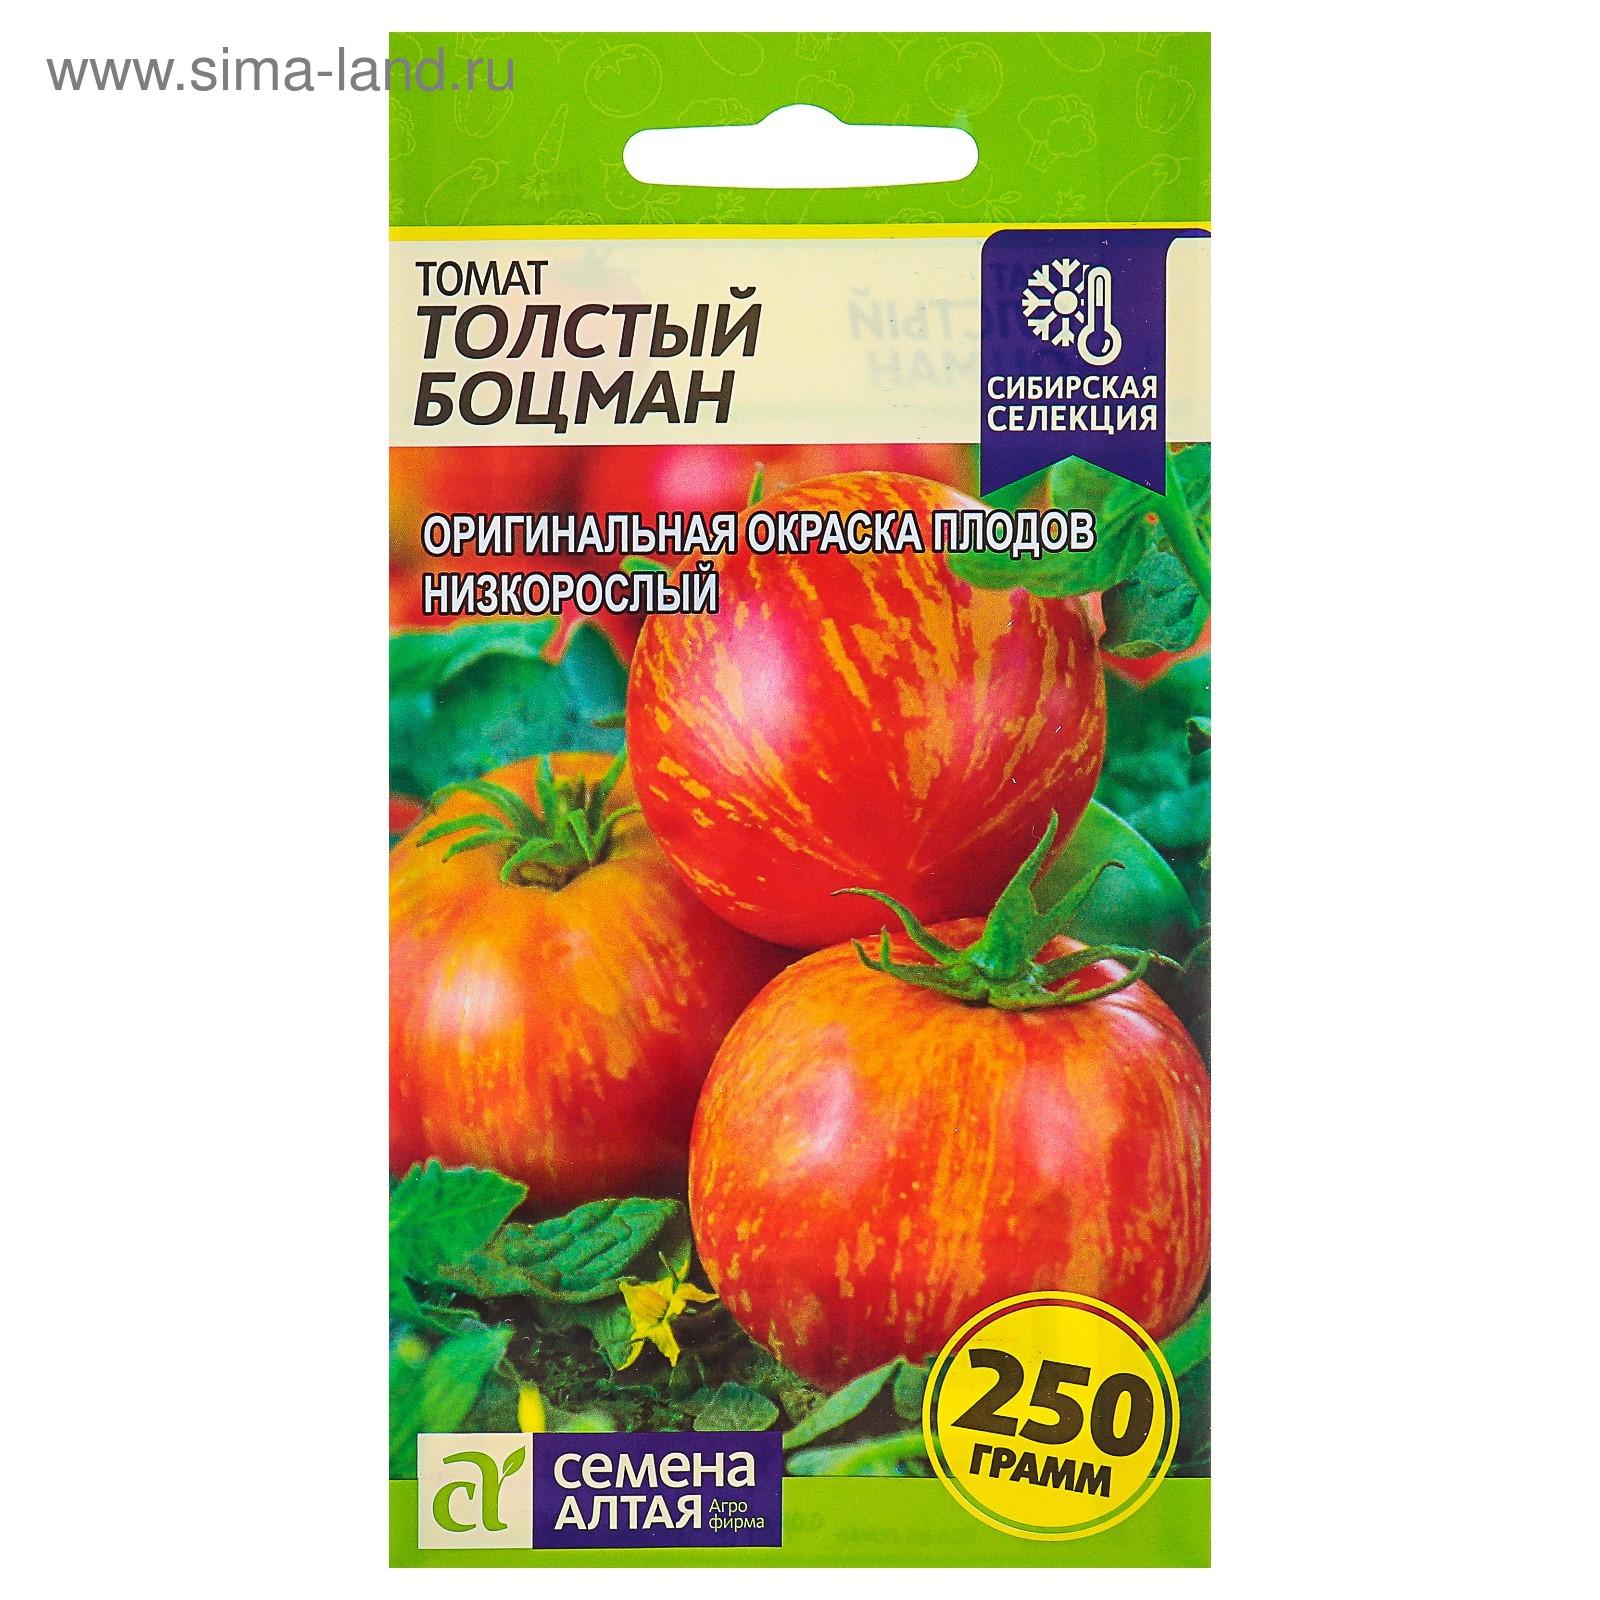 ✅ о томате маныч: описание и характеристики сорта, посадка и уход - tehnomir32.ru